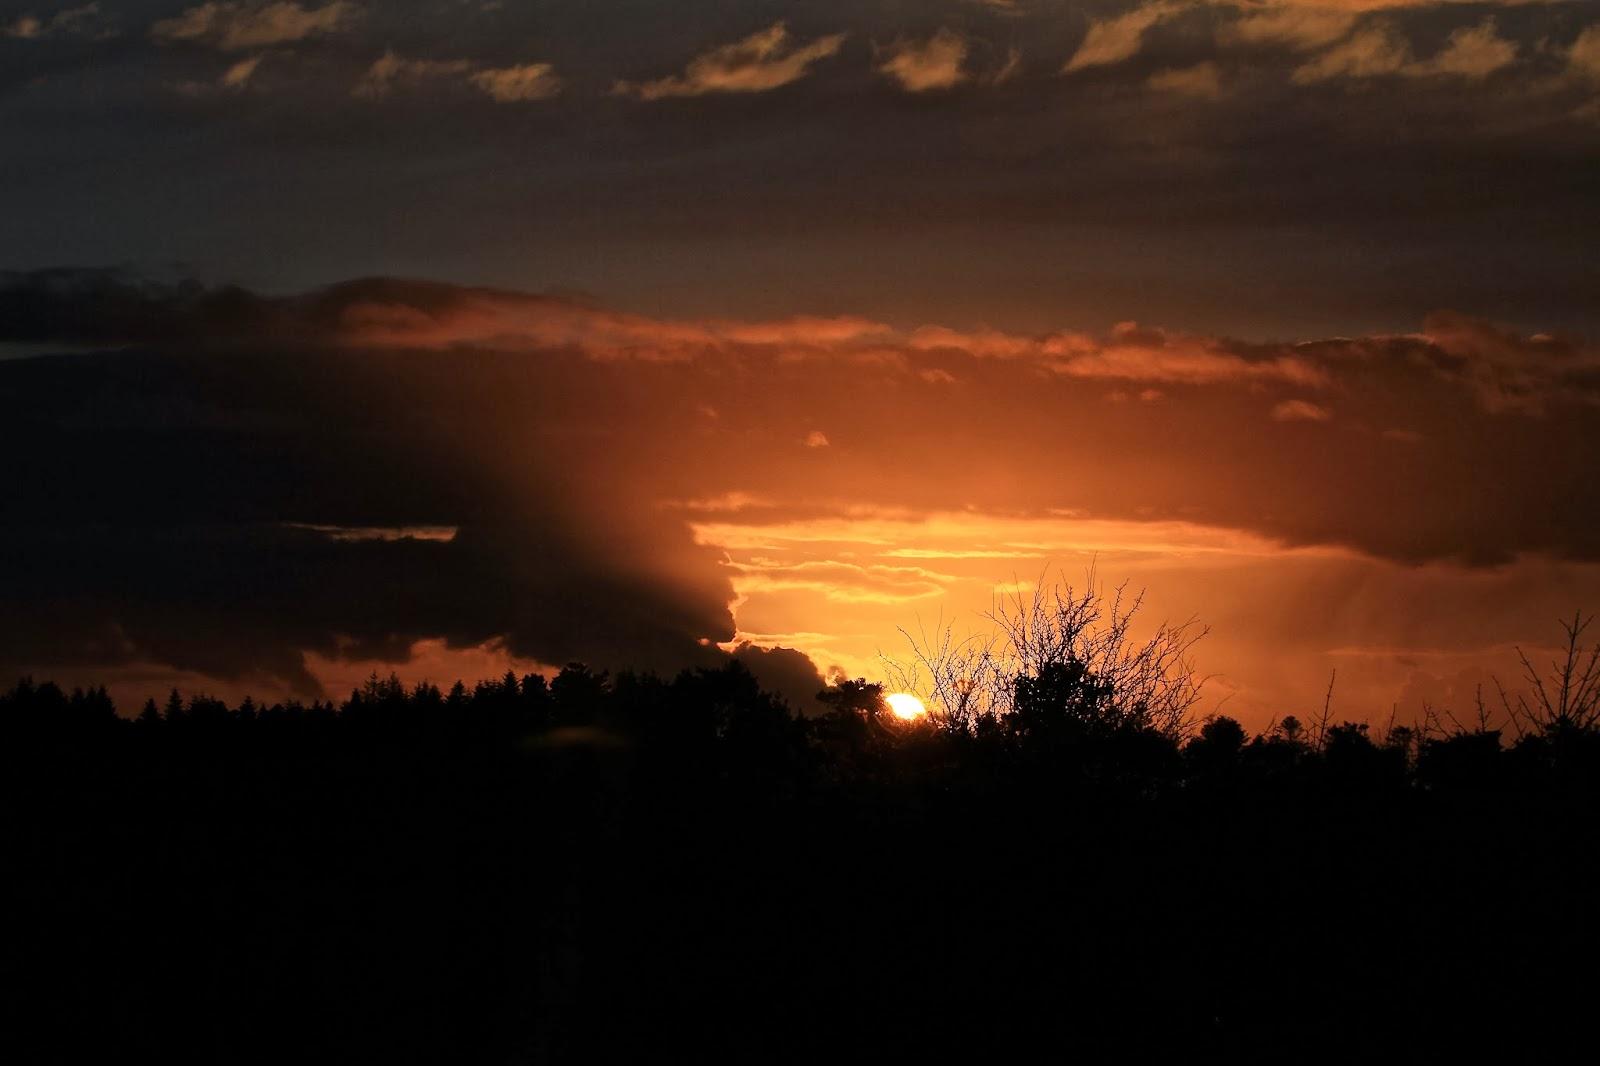 Still drawn to the evening sky